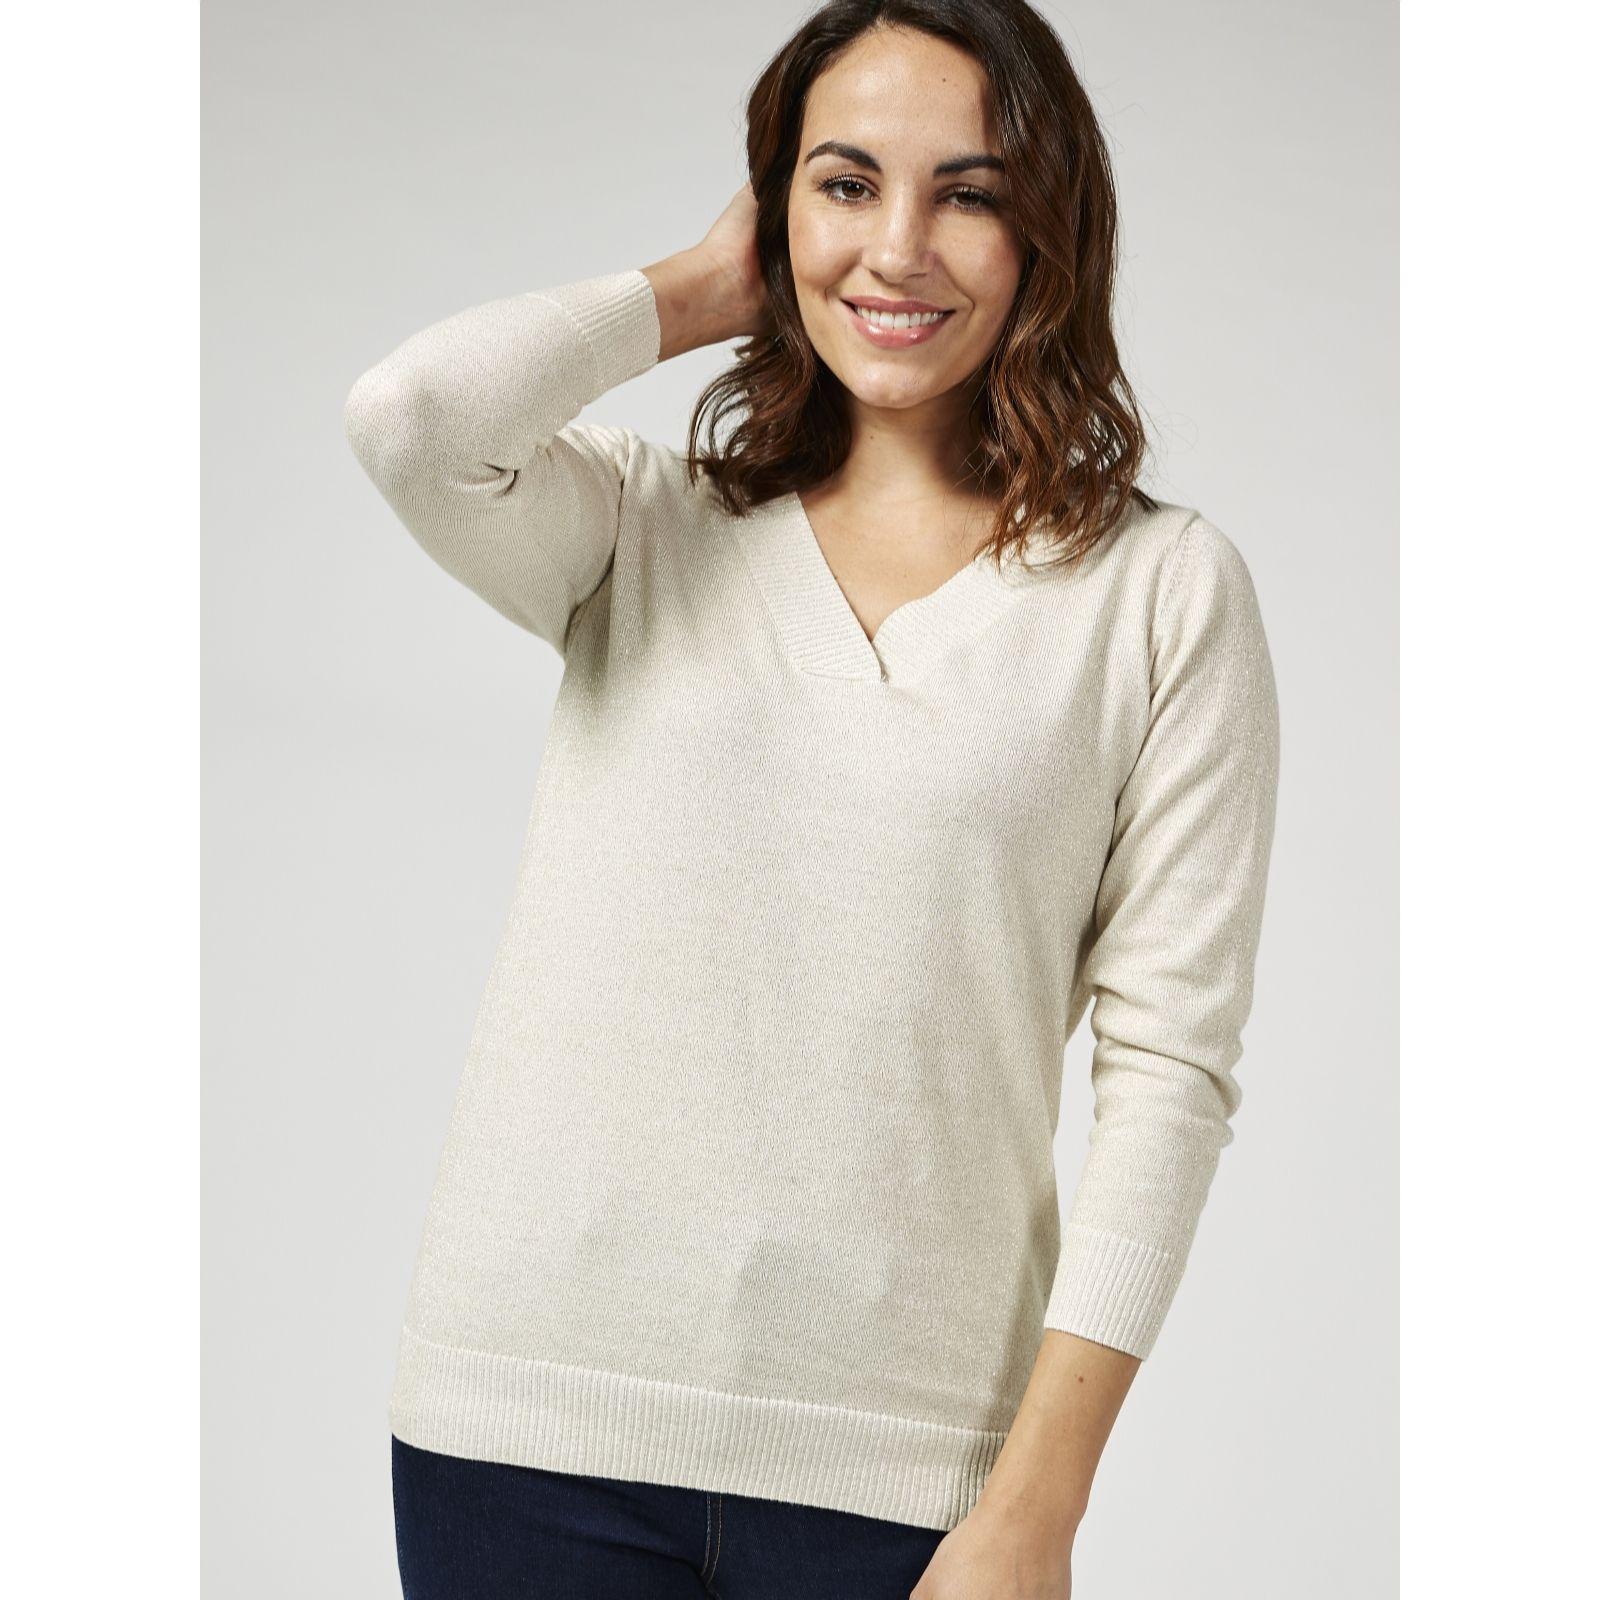 2687424199c Ruth Langsford Cotton Lurex Knit V Neck Jumper - QVC UK